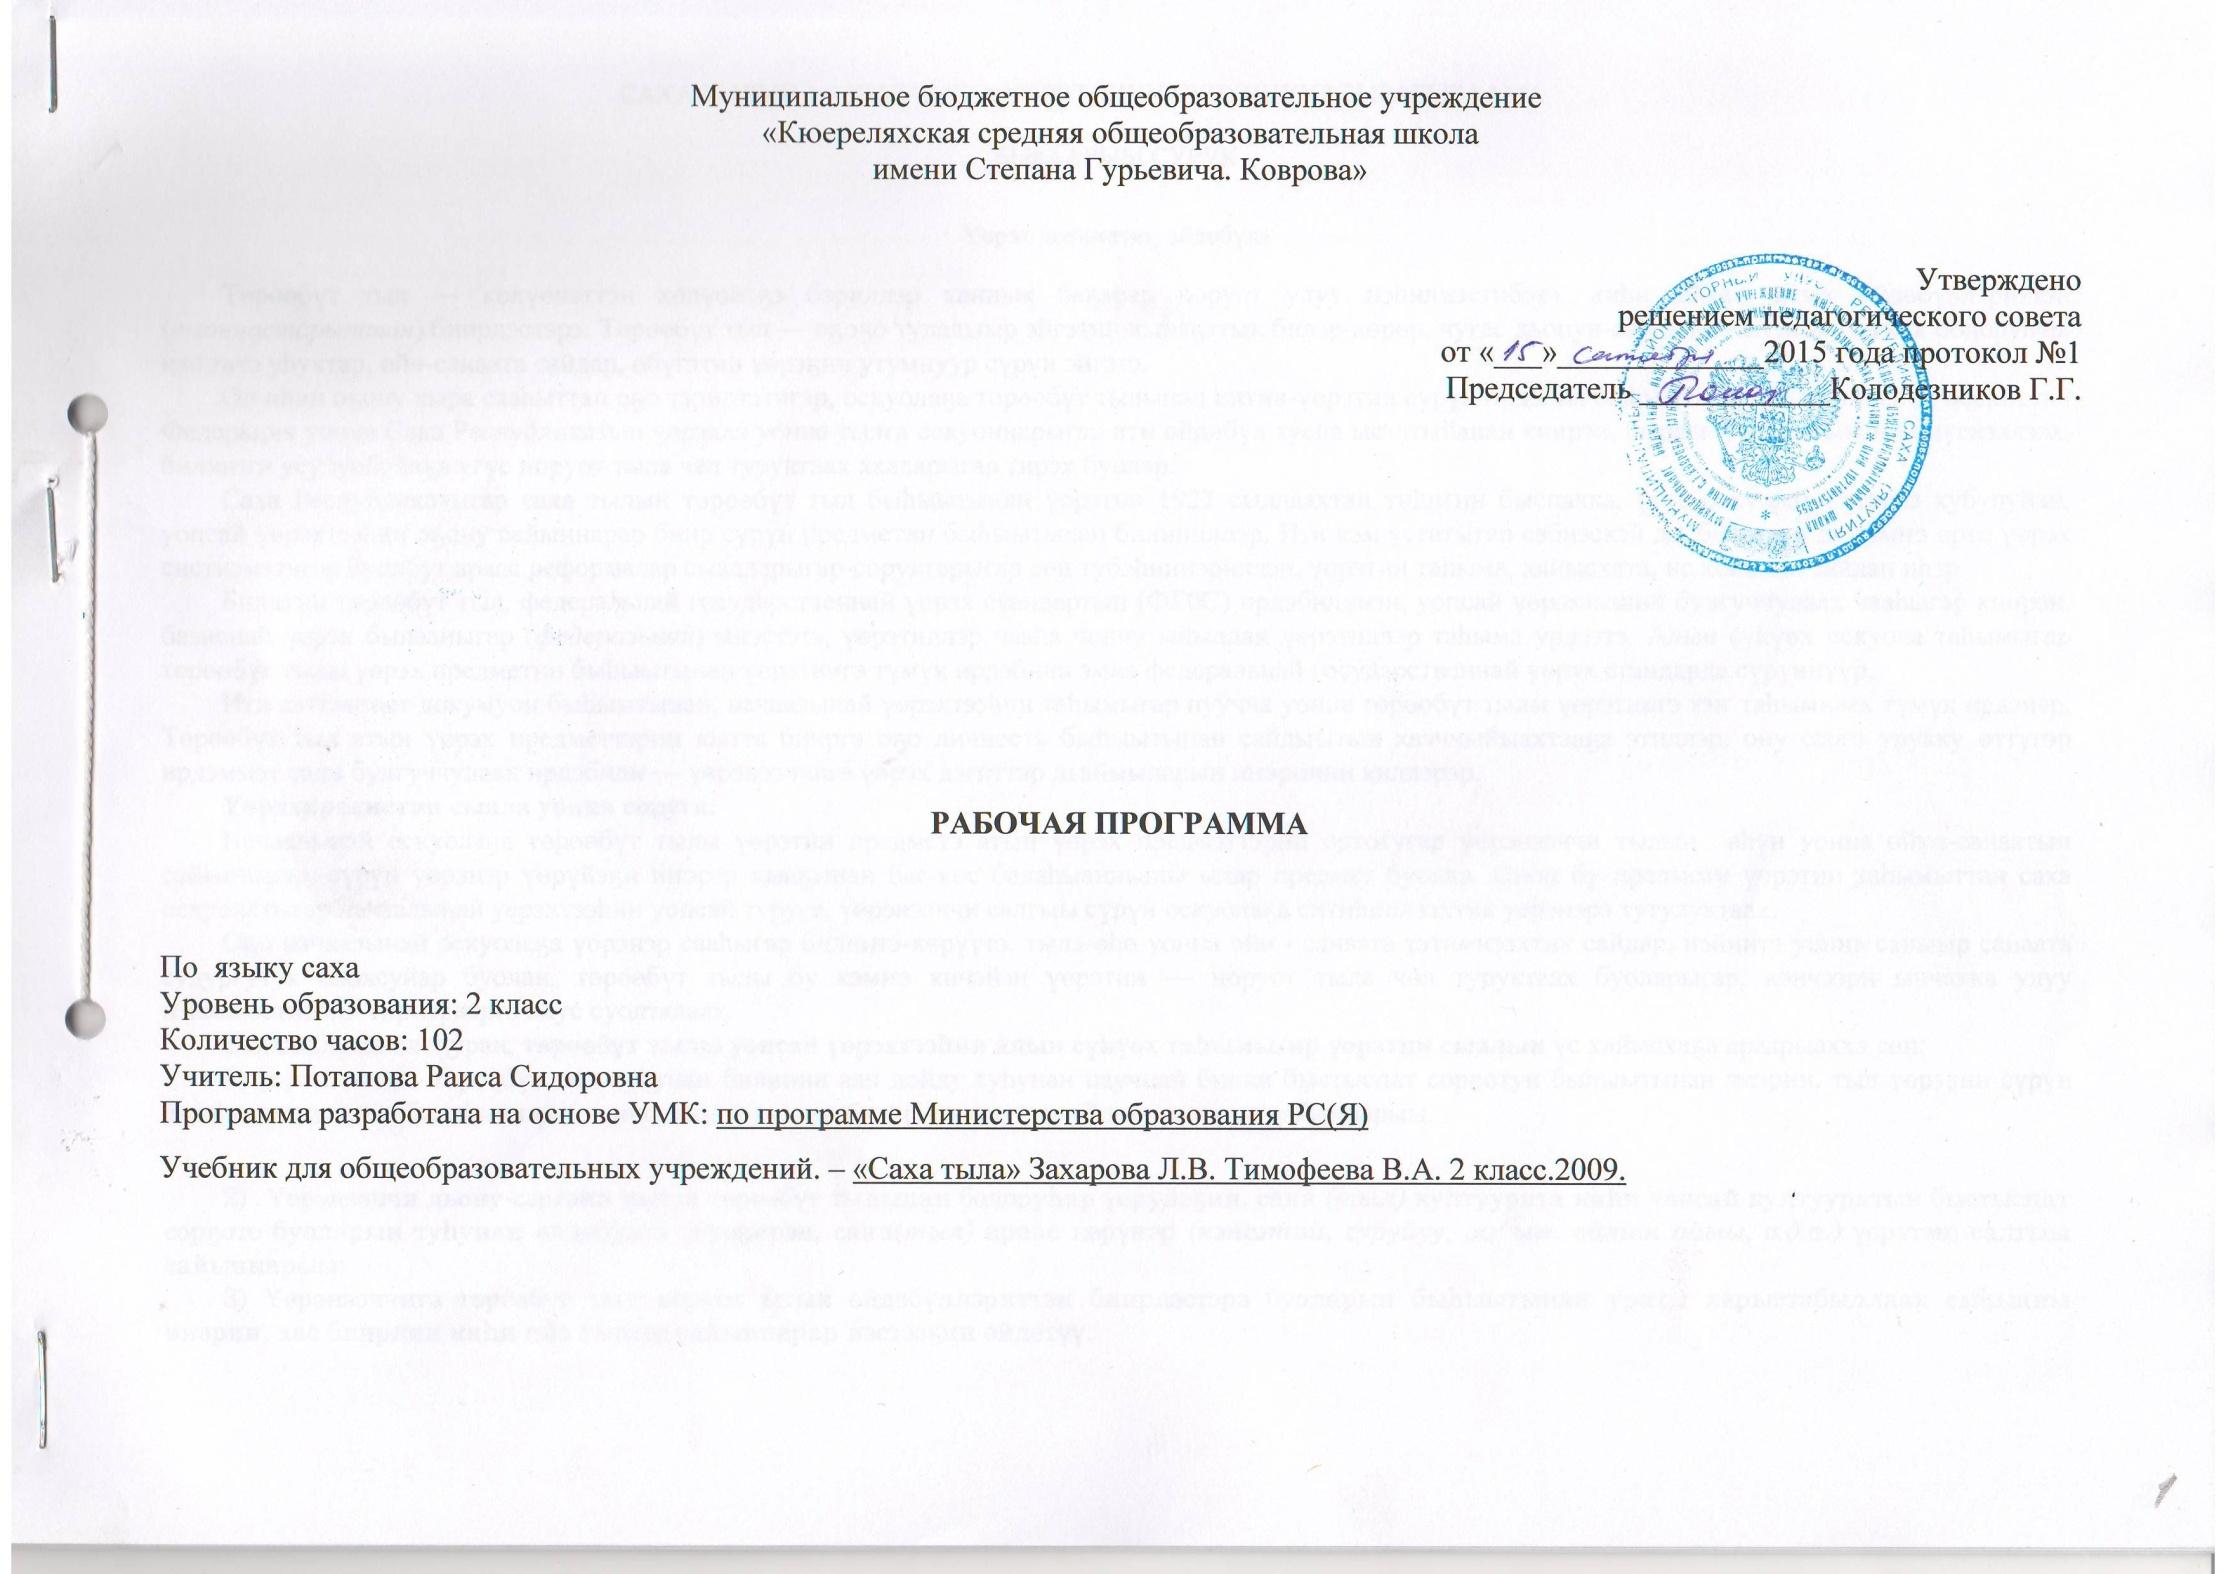 E:\Раиса Сидоровна\2015-2016\10010.JPG